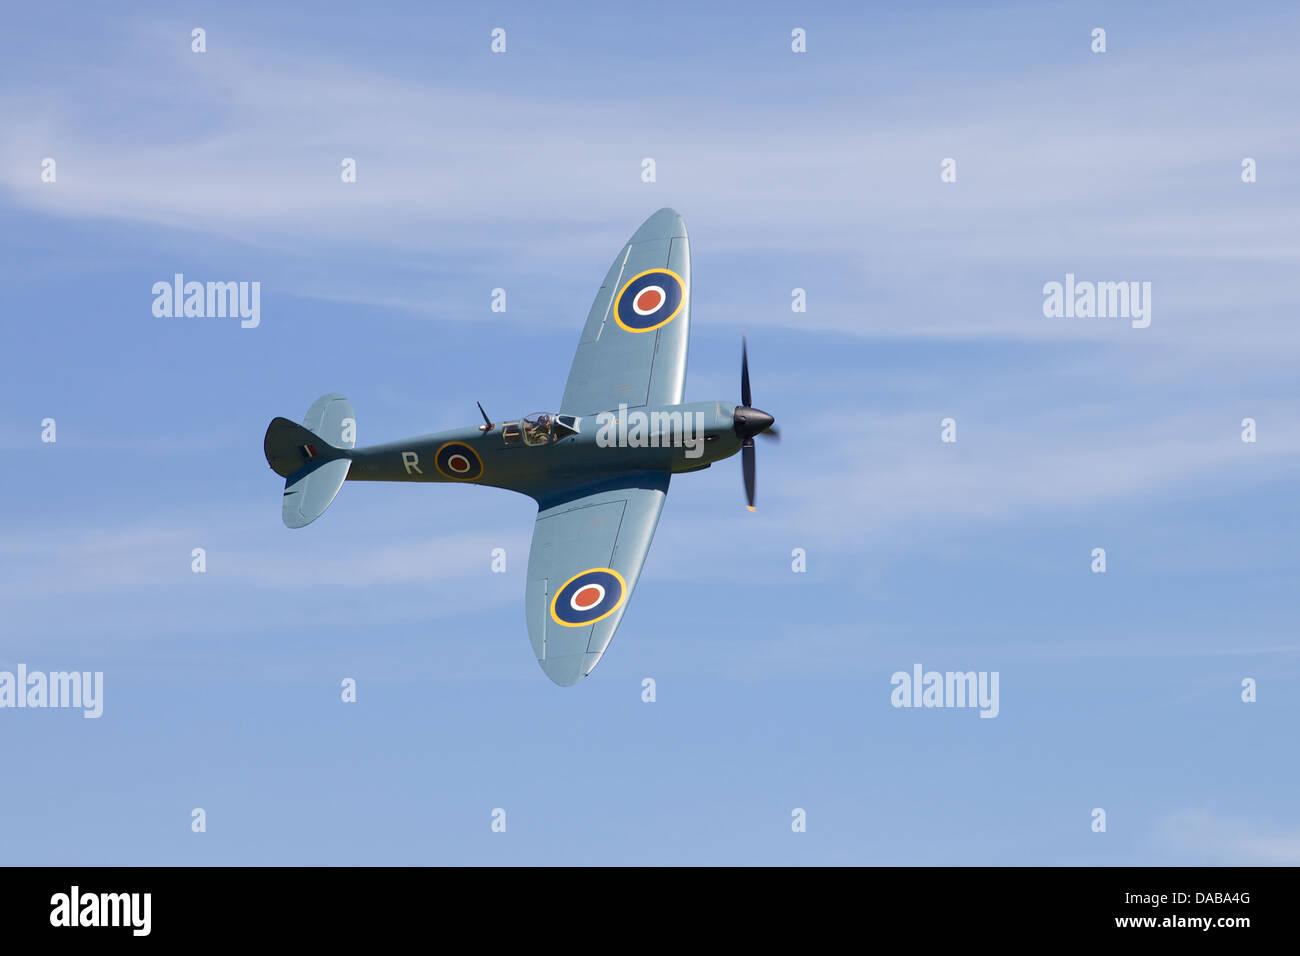 A 1942 Supermarine Spitfire, England - Stock Image